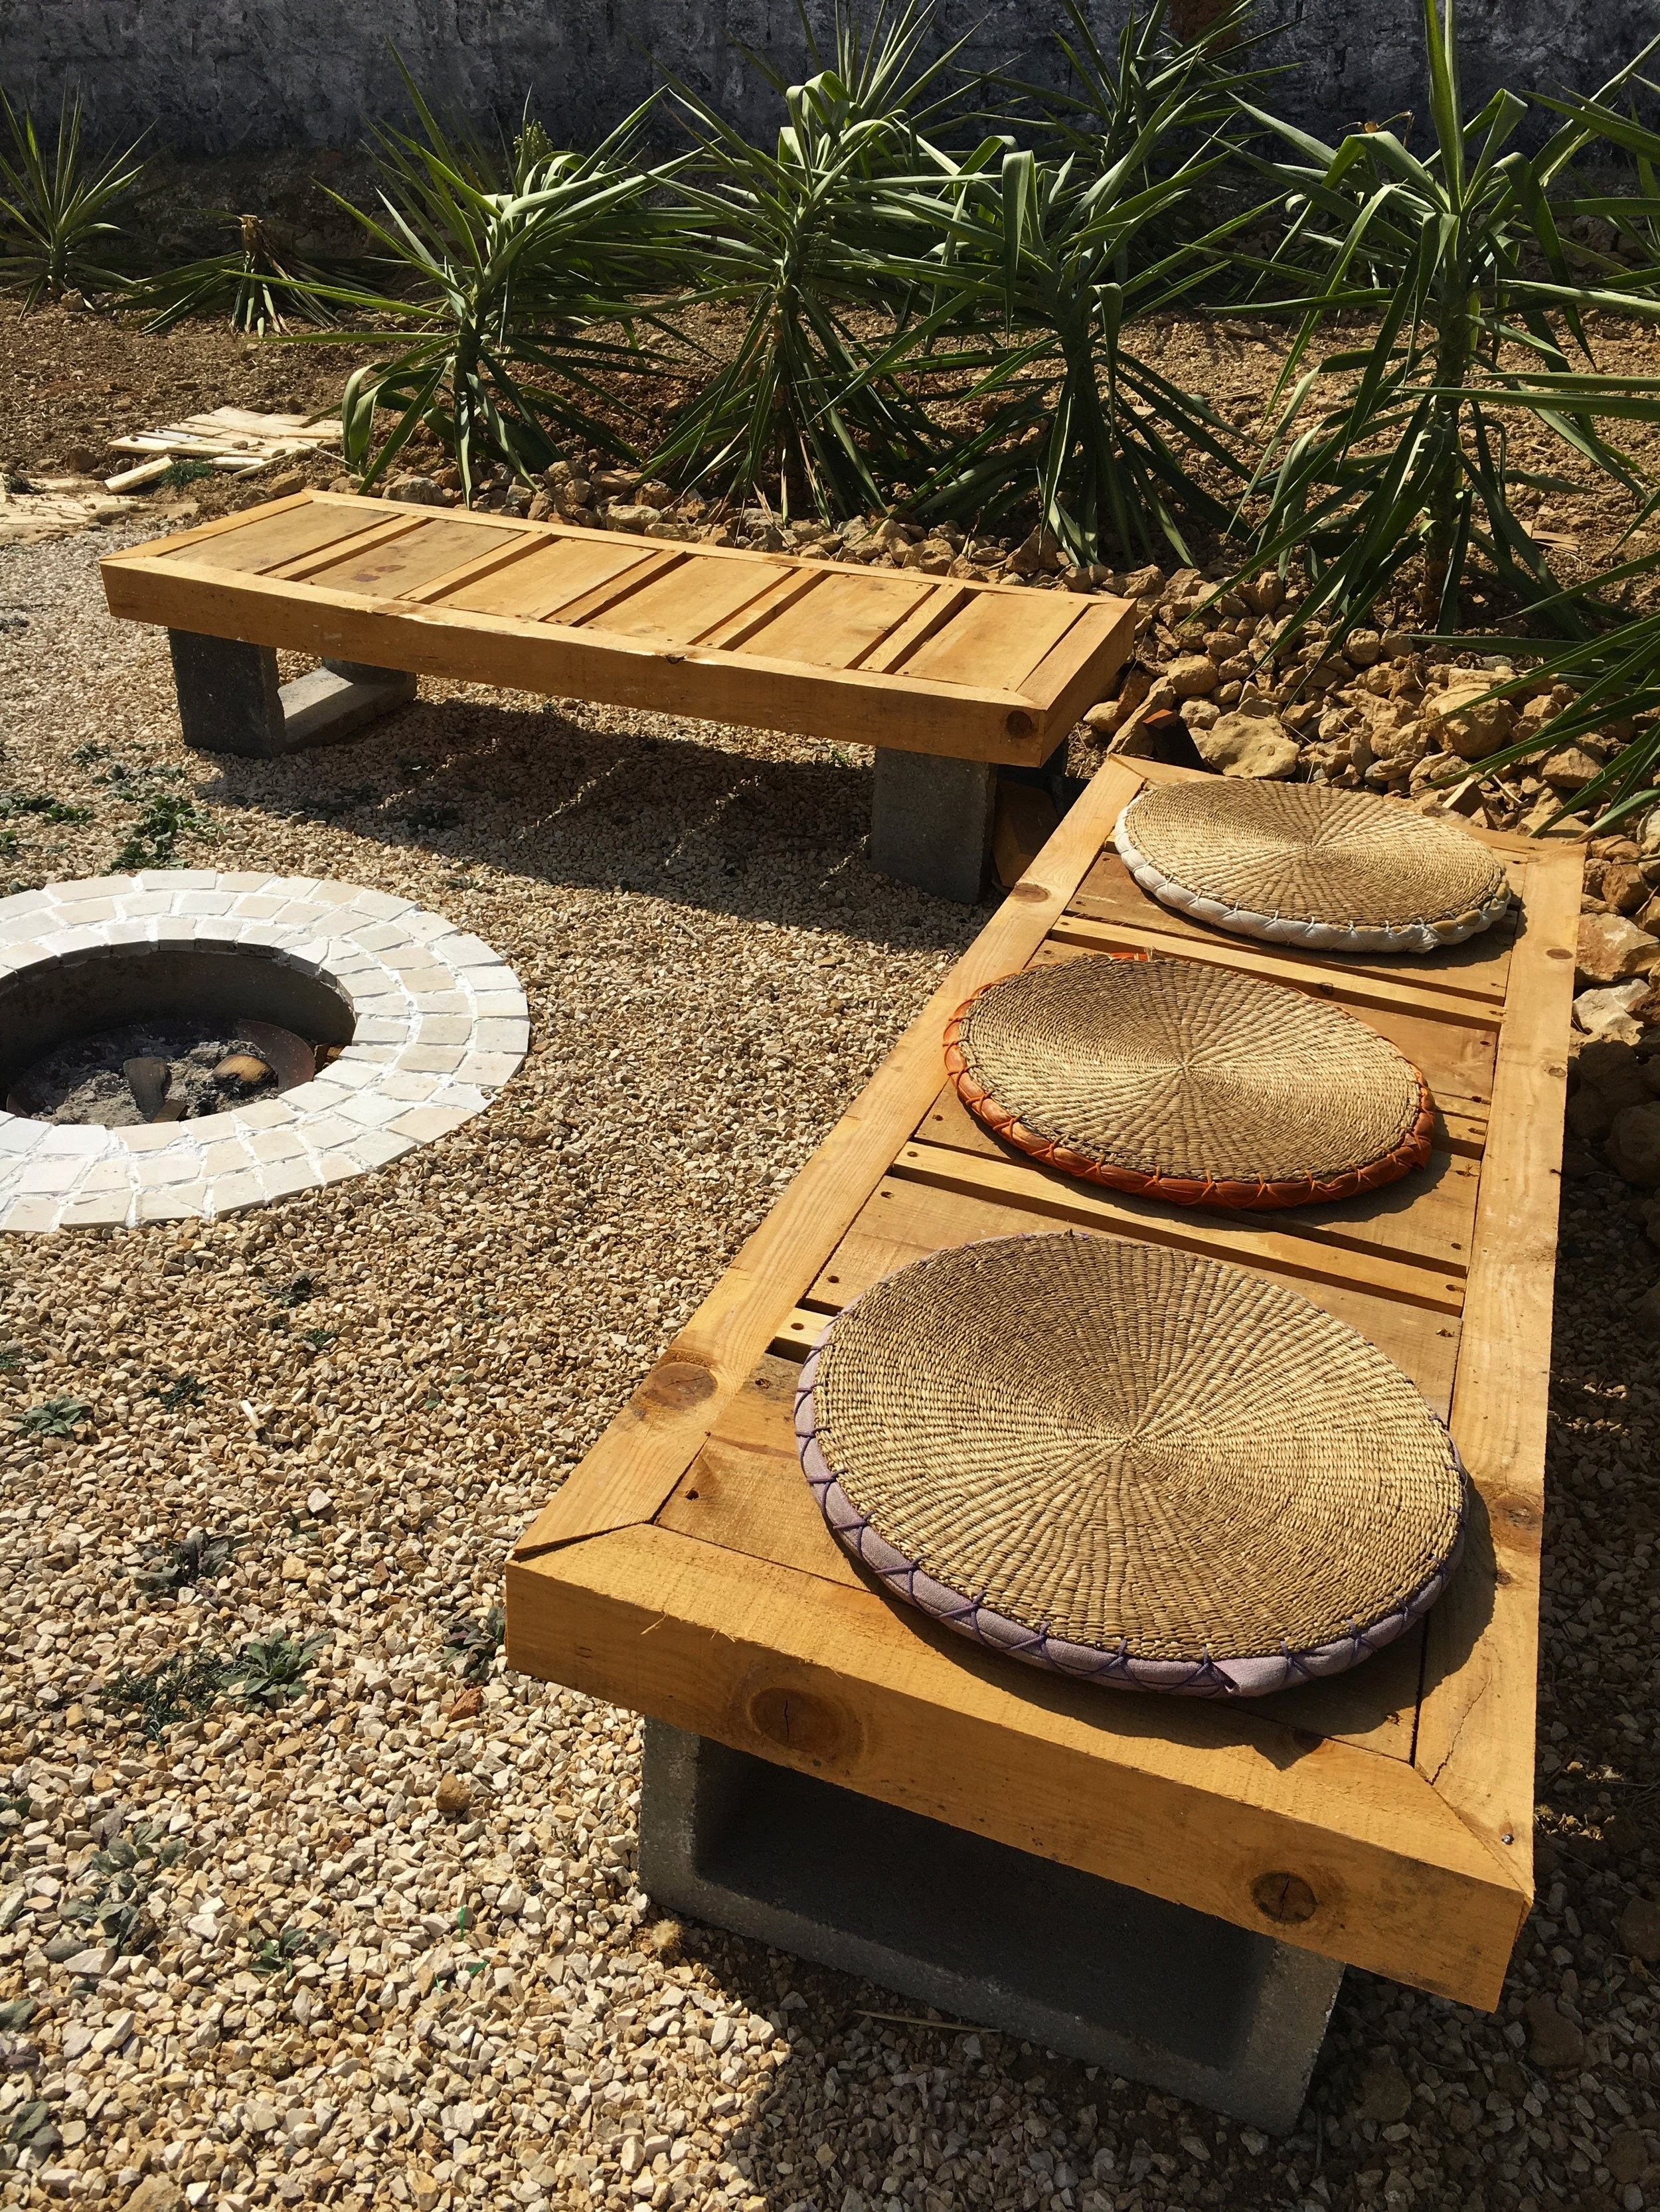 Art-cafe-benches.jpg